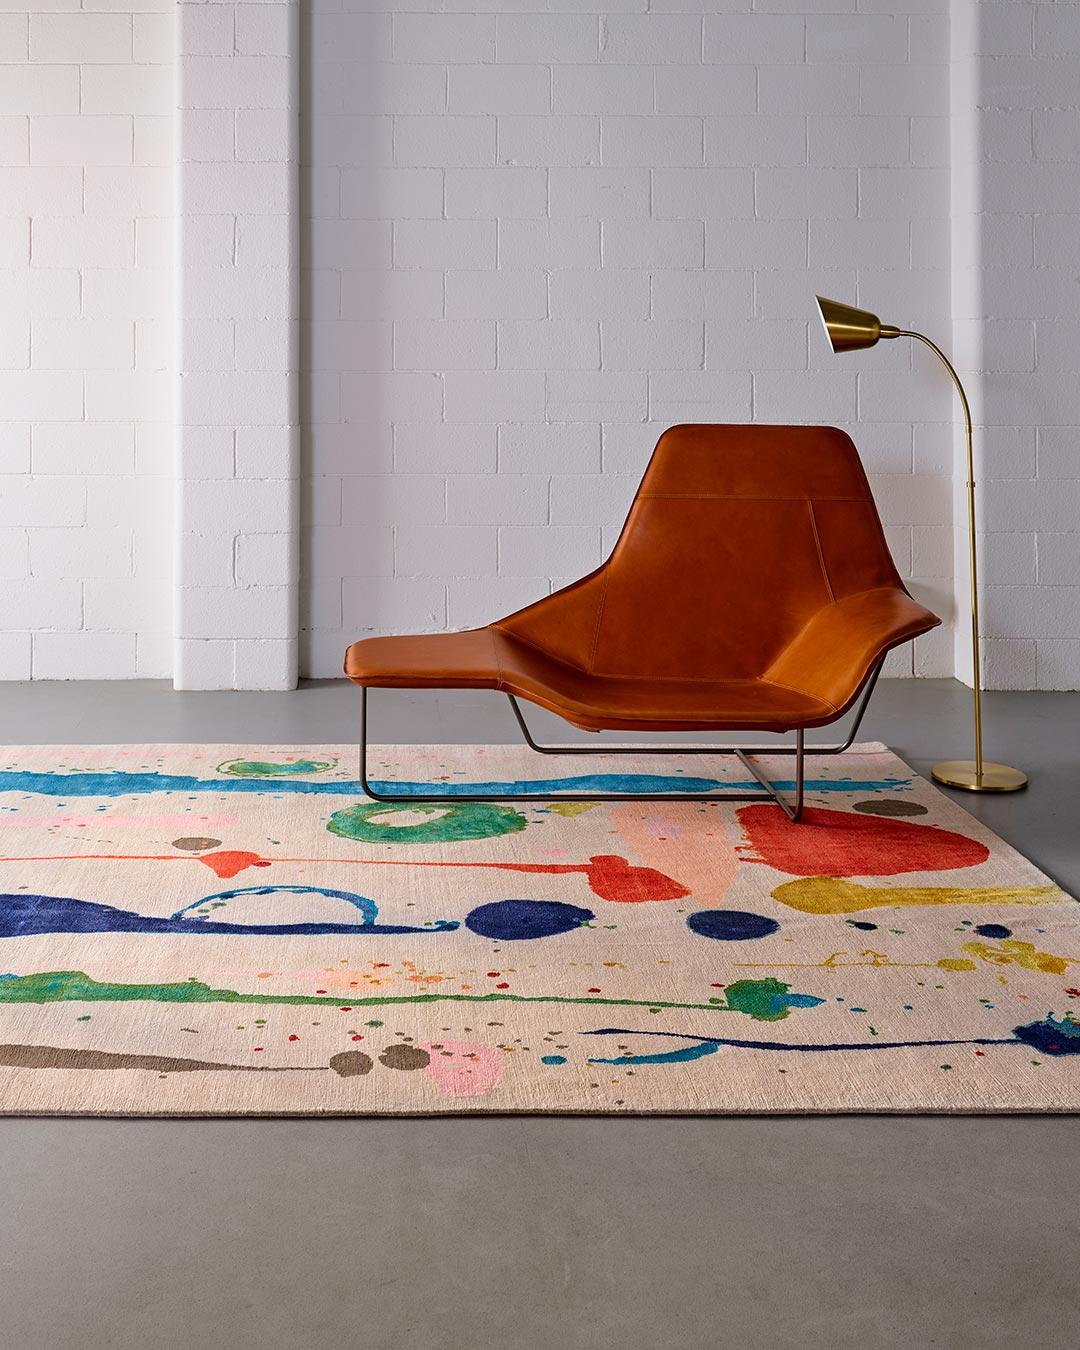 Living room image of painterly Dream Garden rug by Louise Olsen